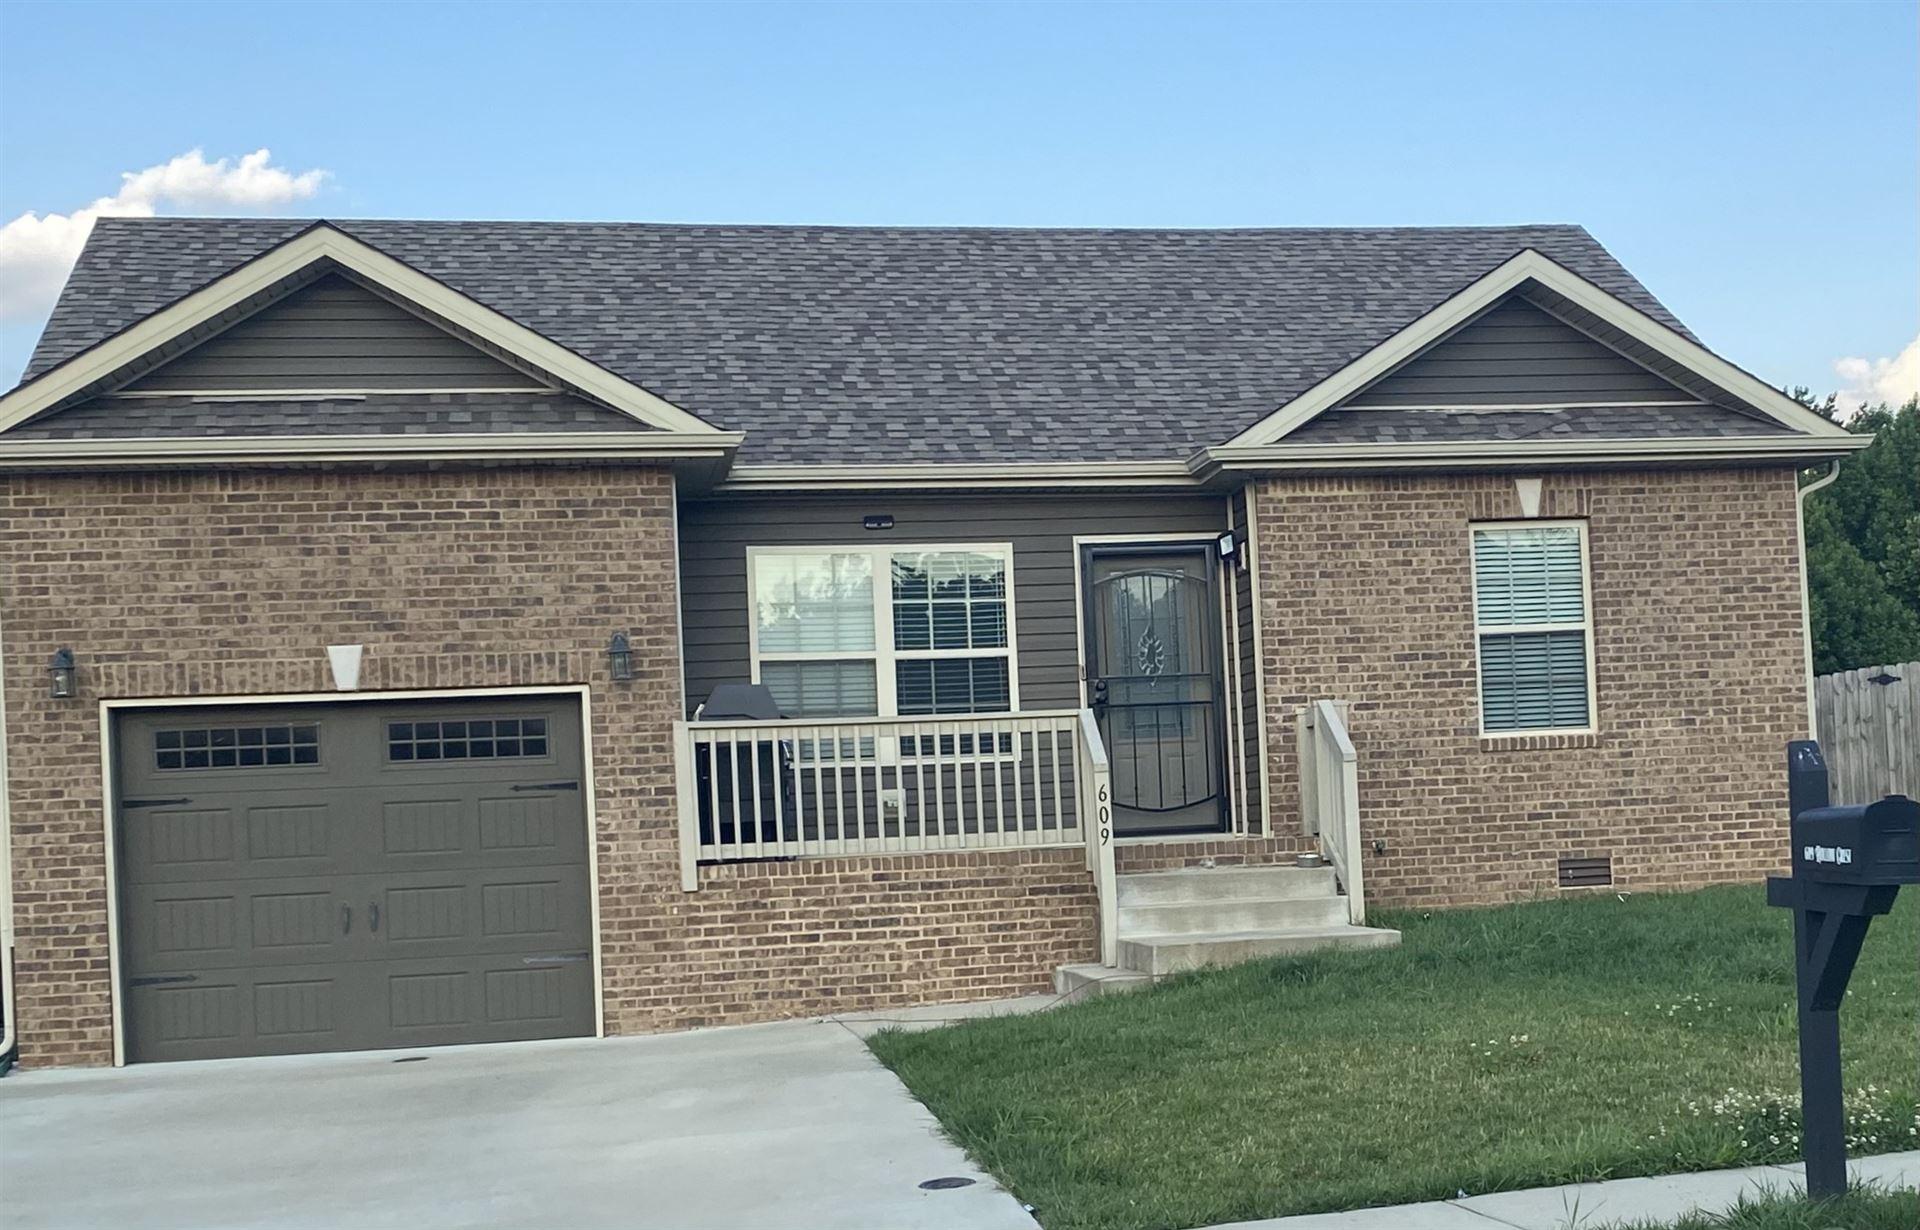 609 Hollow Crest, Clarksville, TN 37042 - MLS#: 2263971